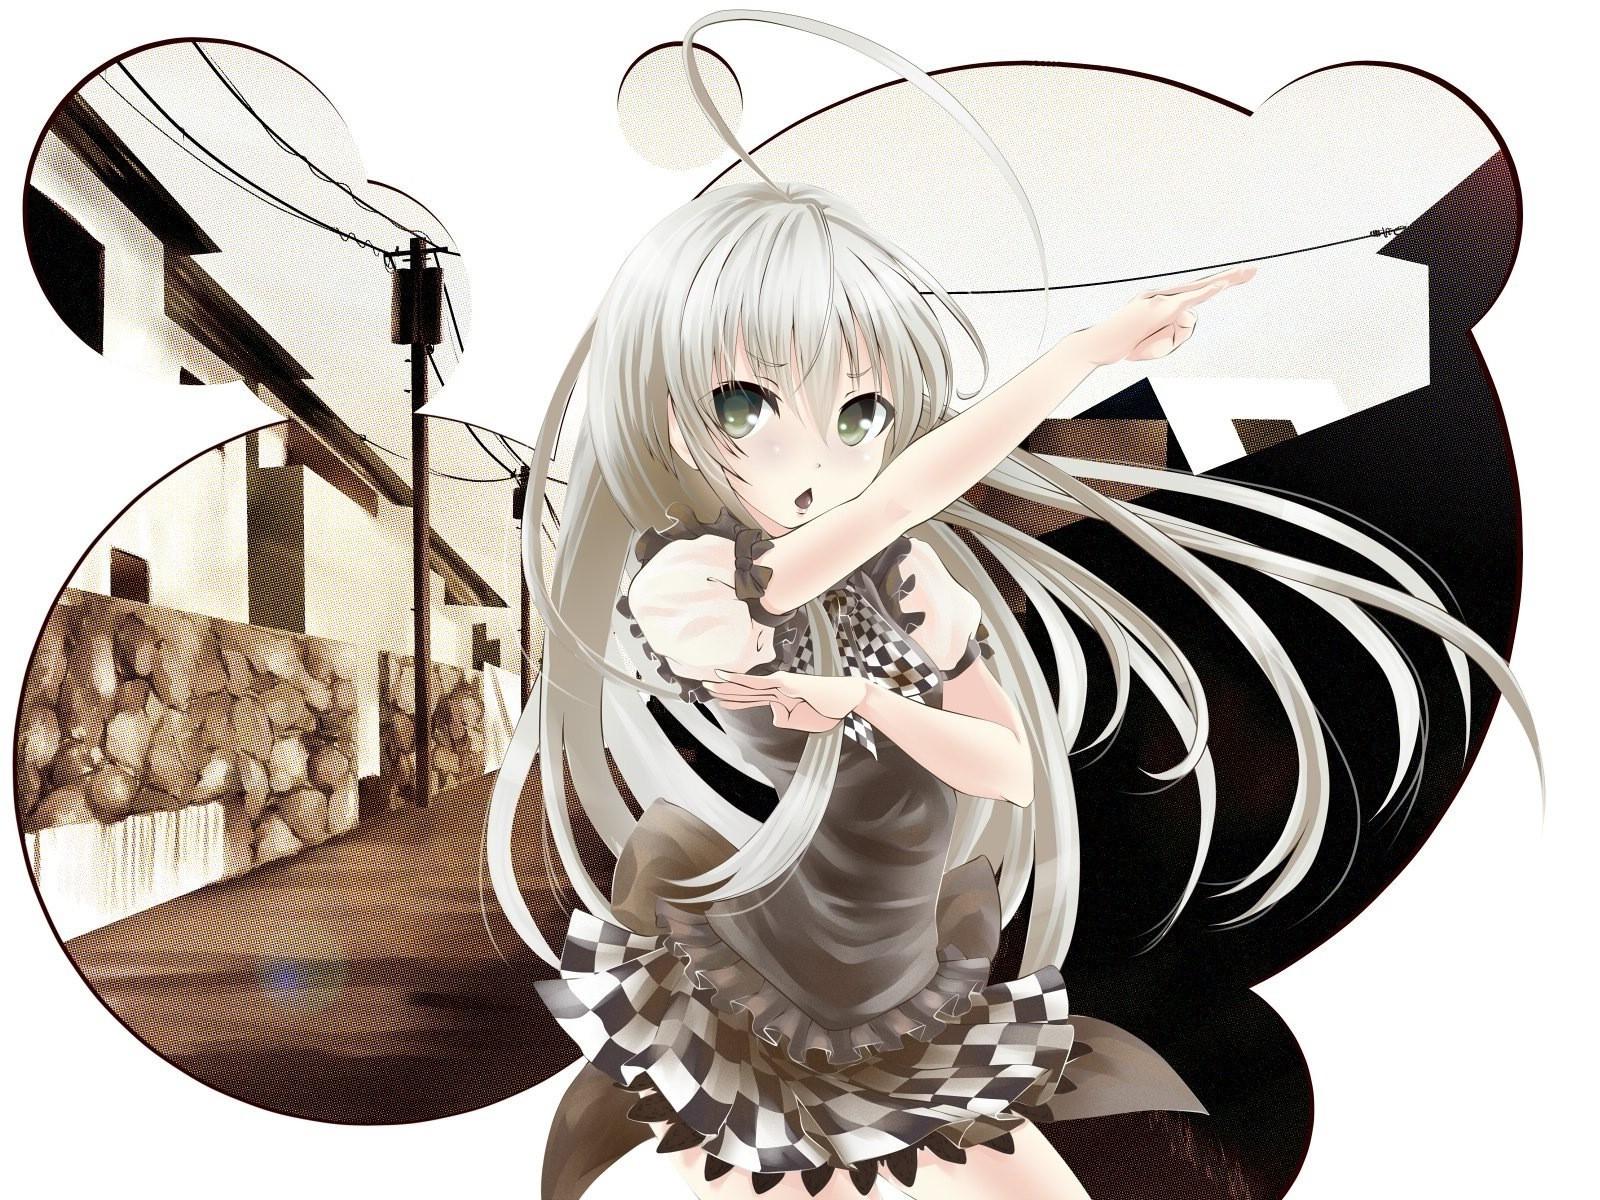 Wallpaper 1600x1200 Px Anime Haiyore Nyaruko San Monochrome